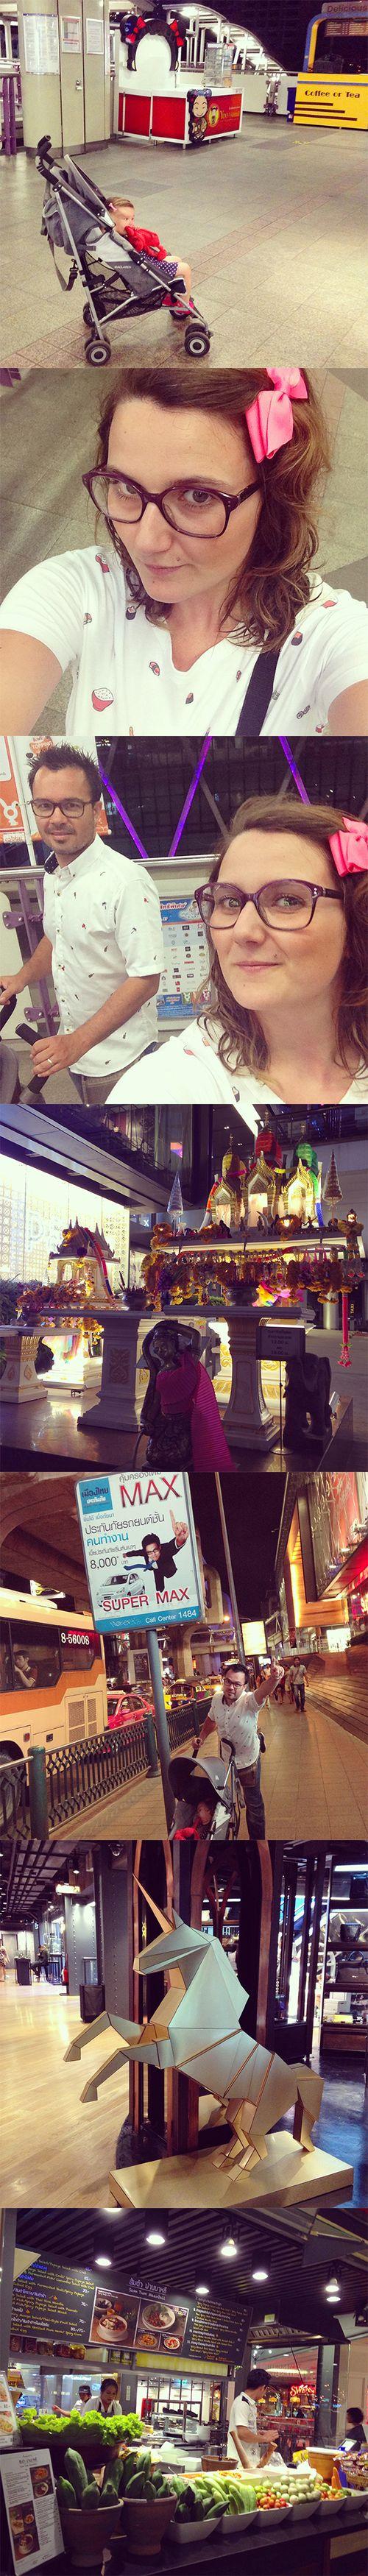 Bangkok-voyage-famille-pimpandpomme-thailande-28